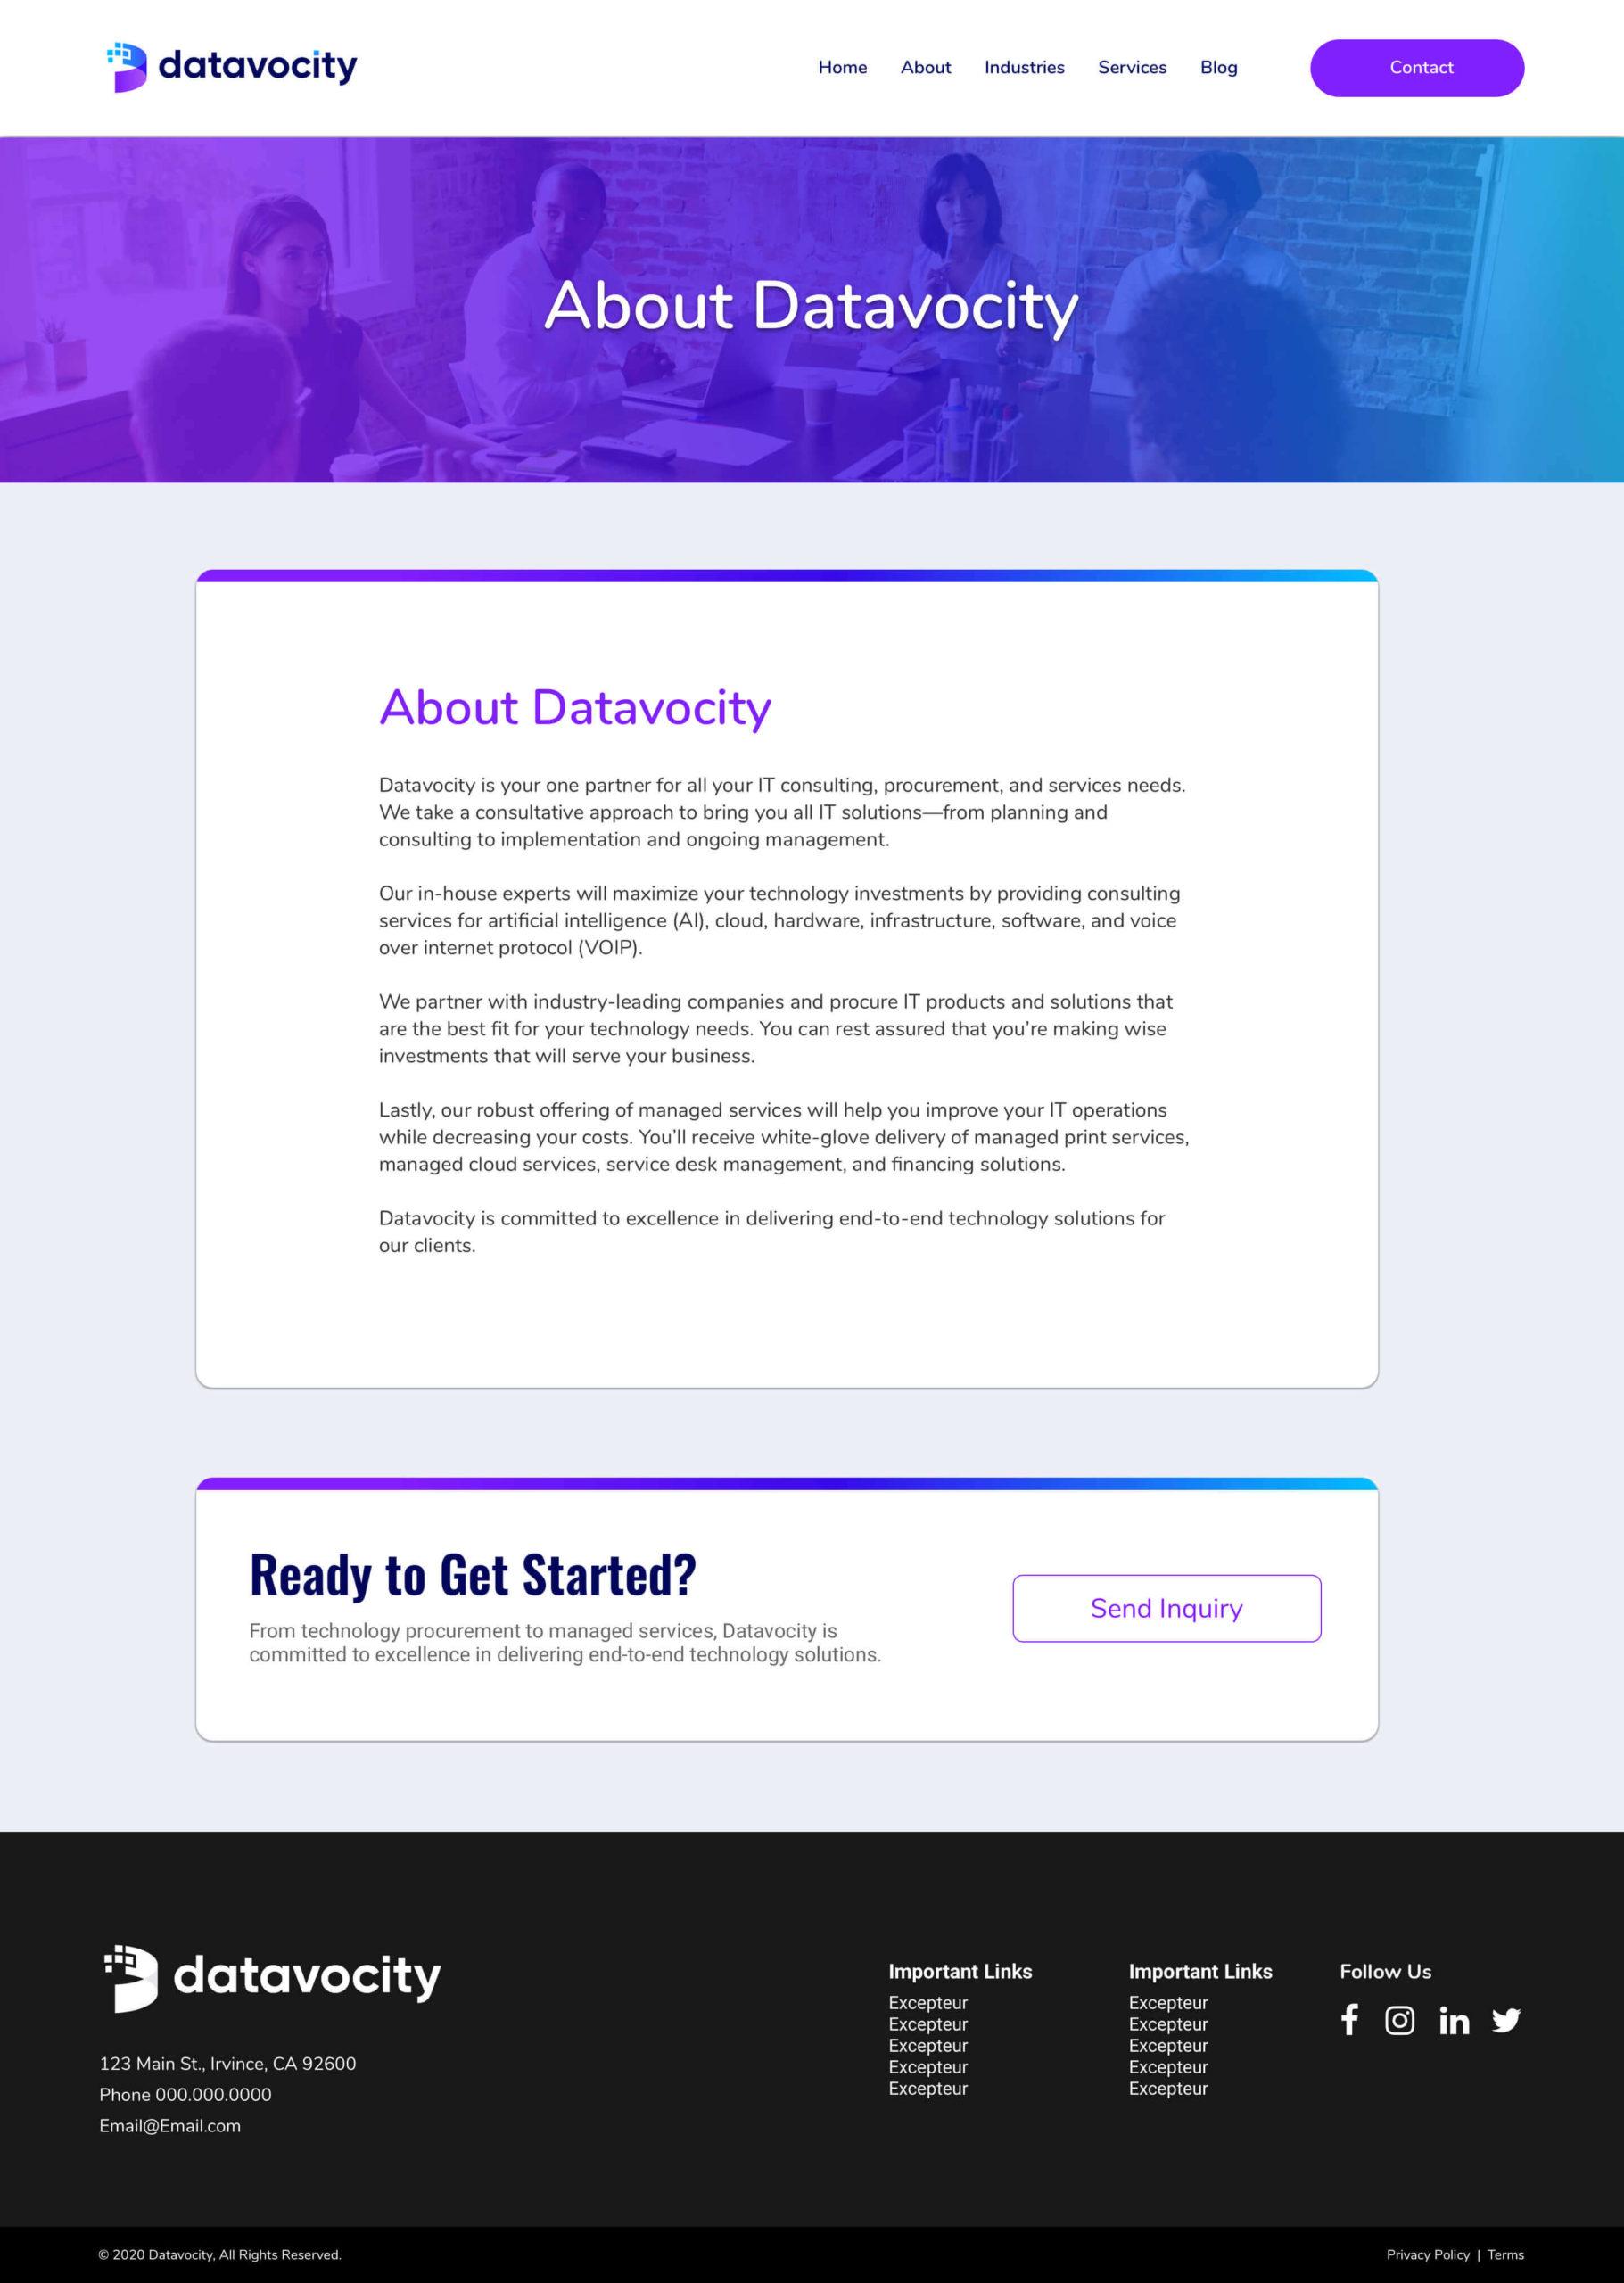 Datavocity-Secondary-Page